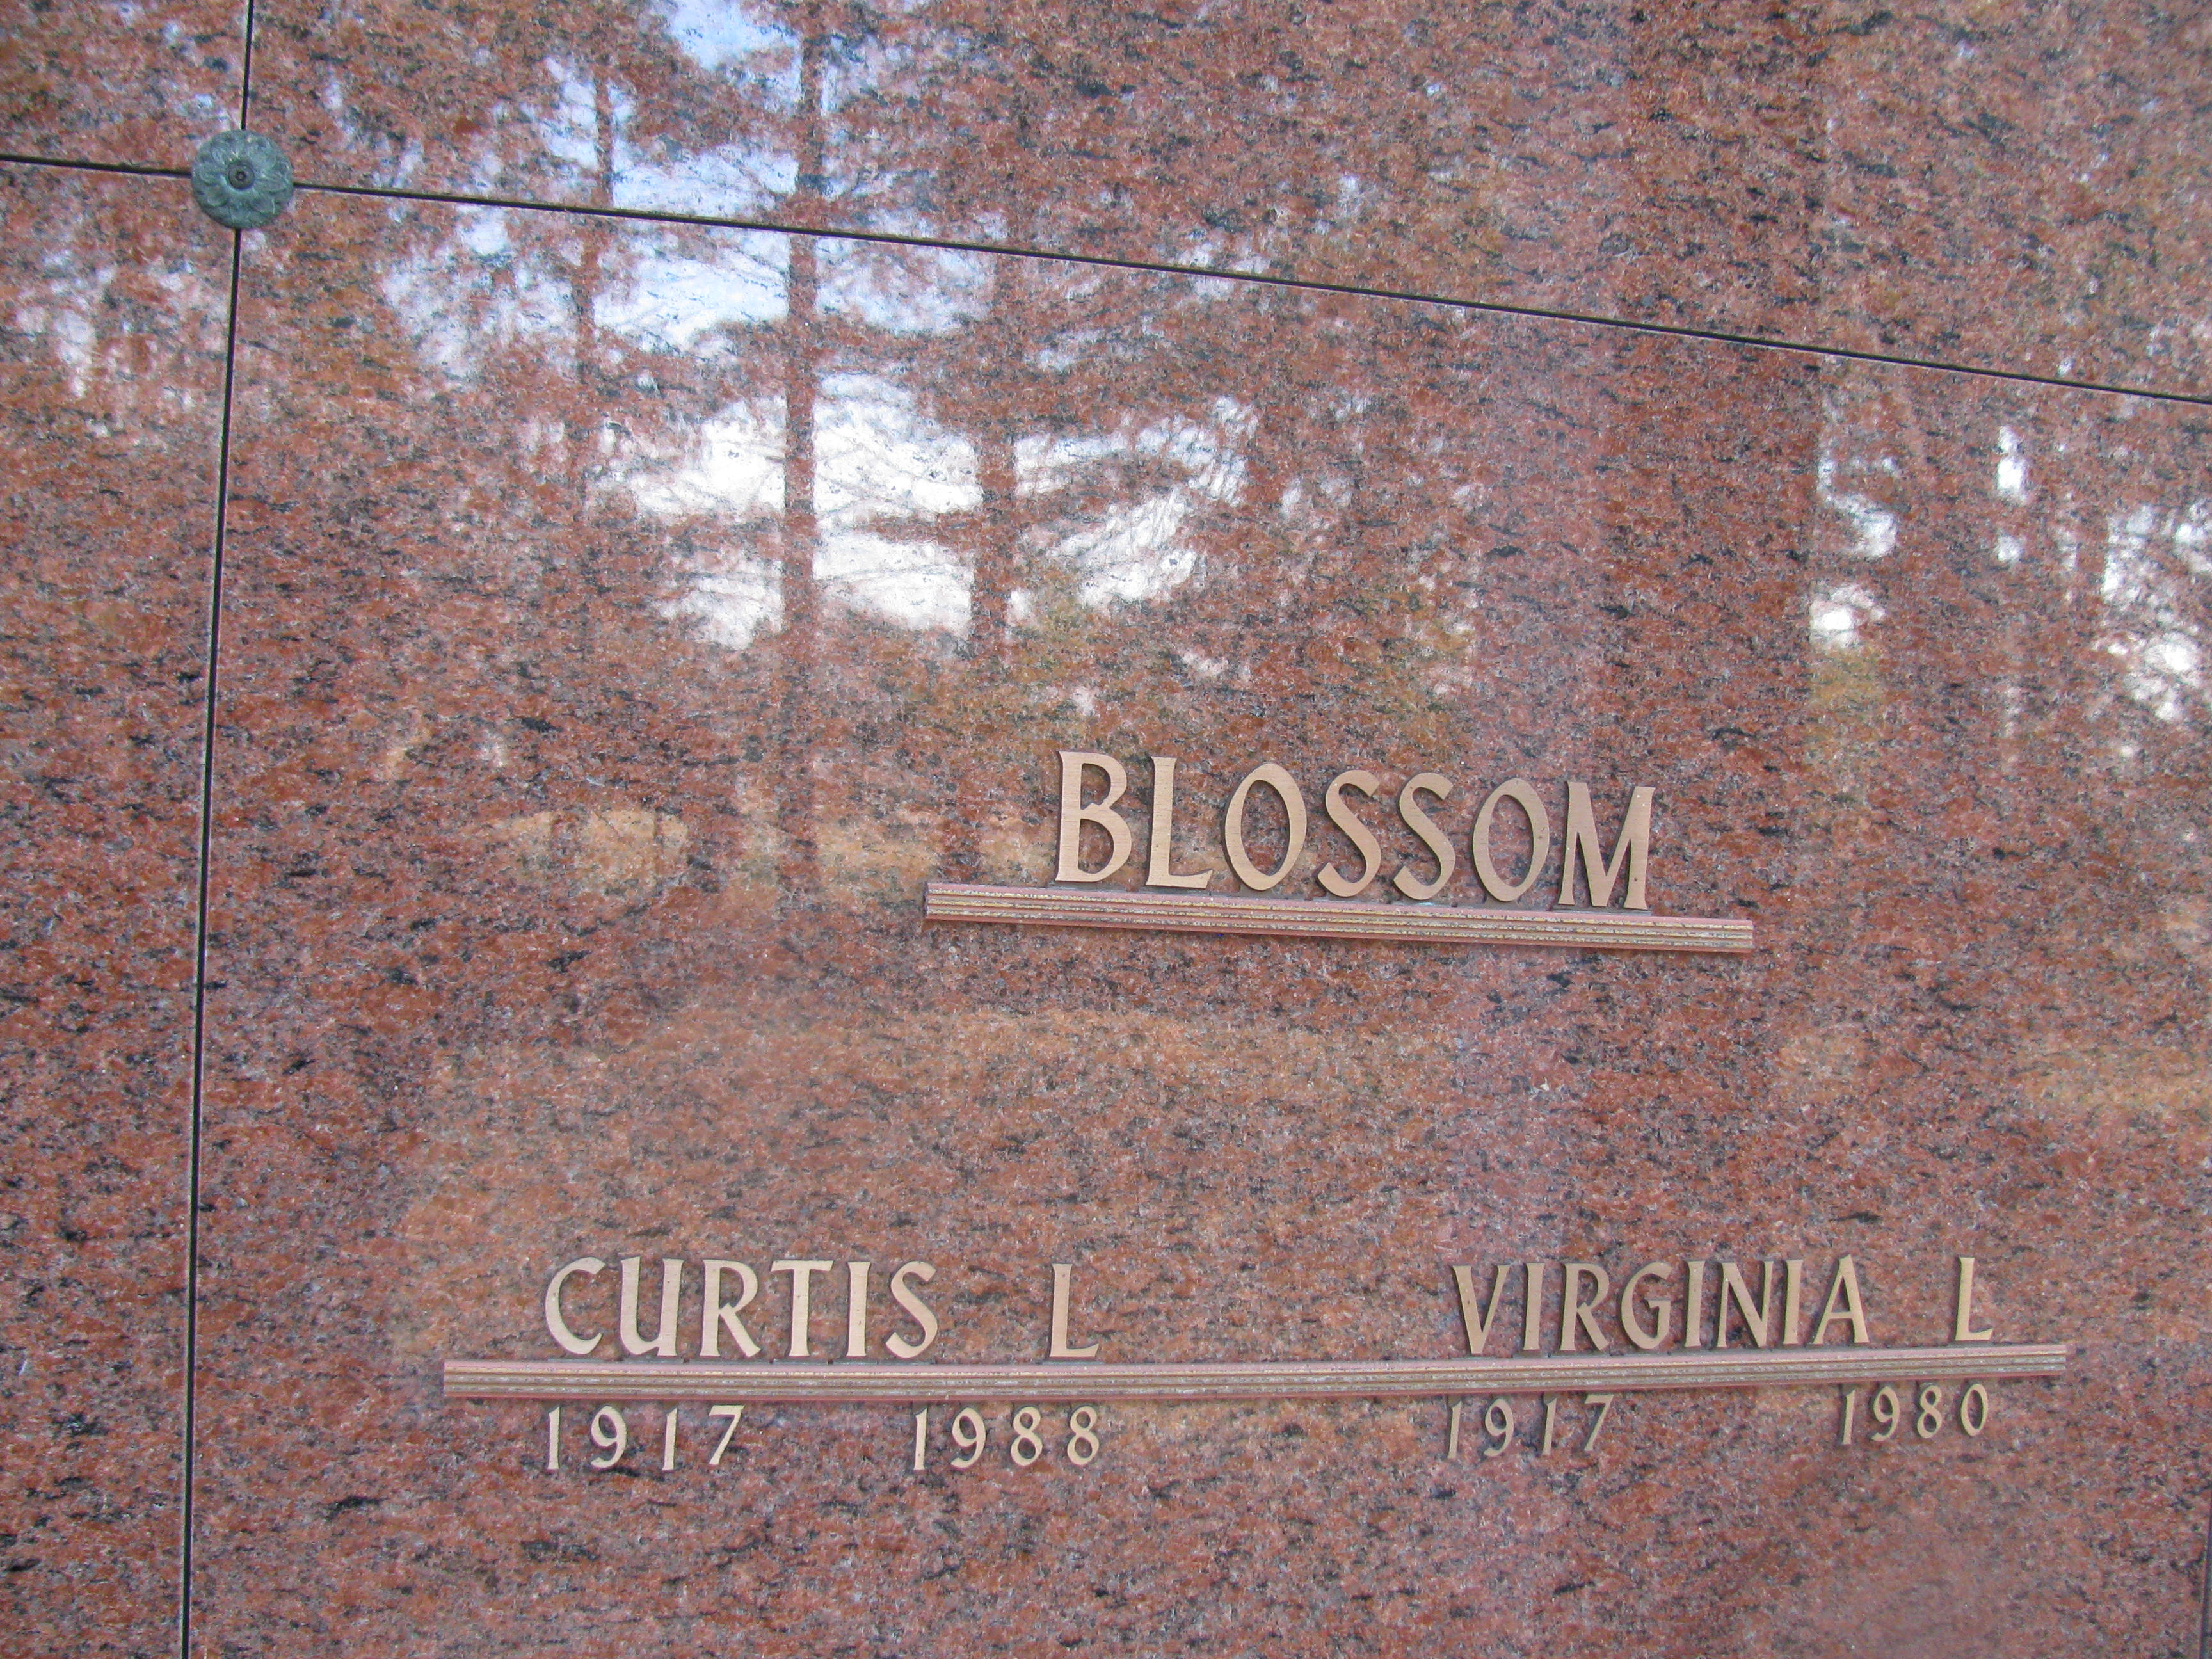 Curtis L Blossom